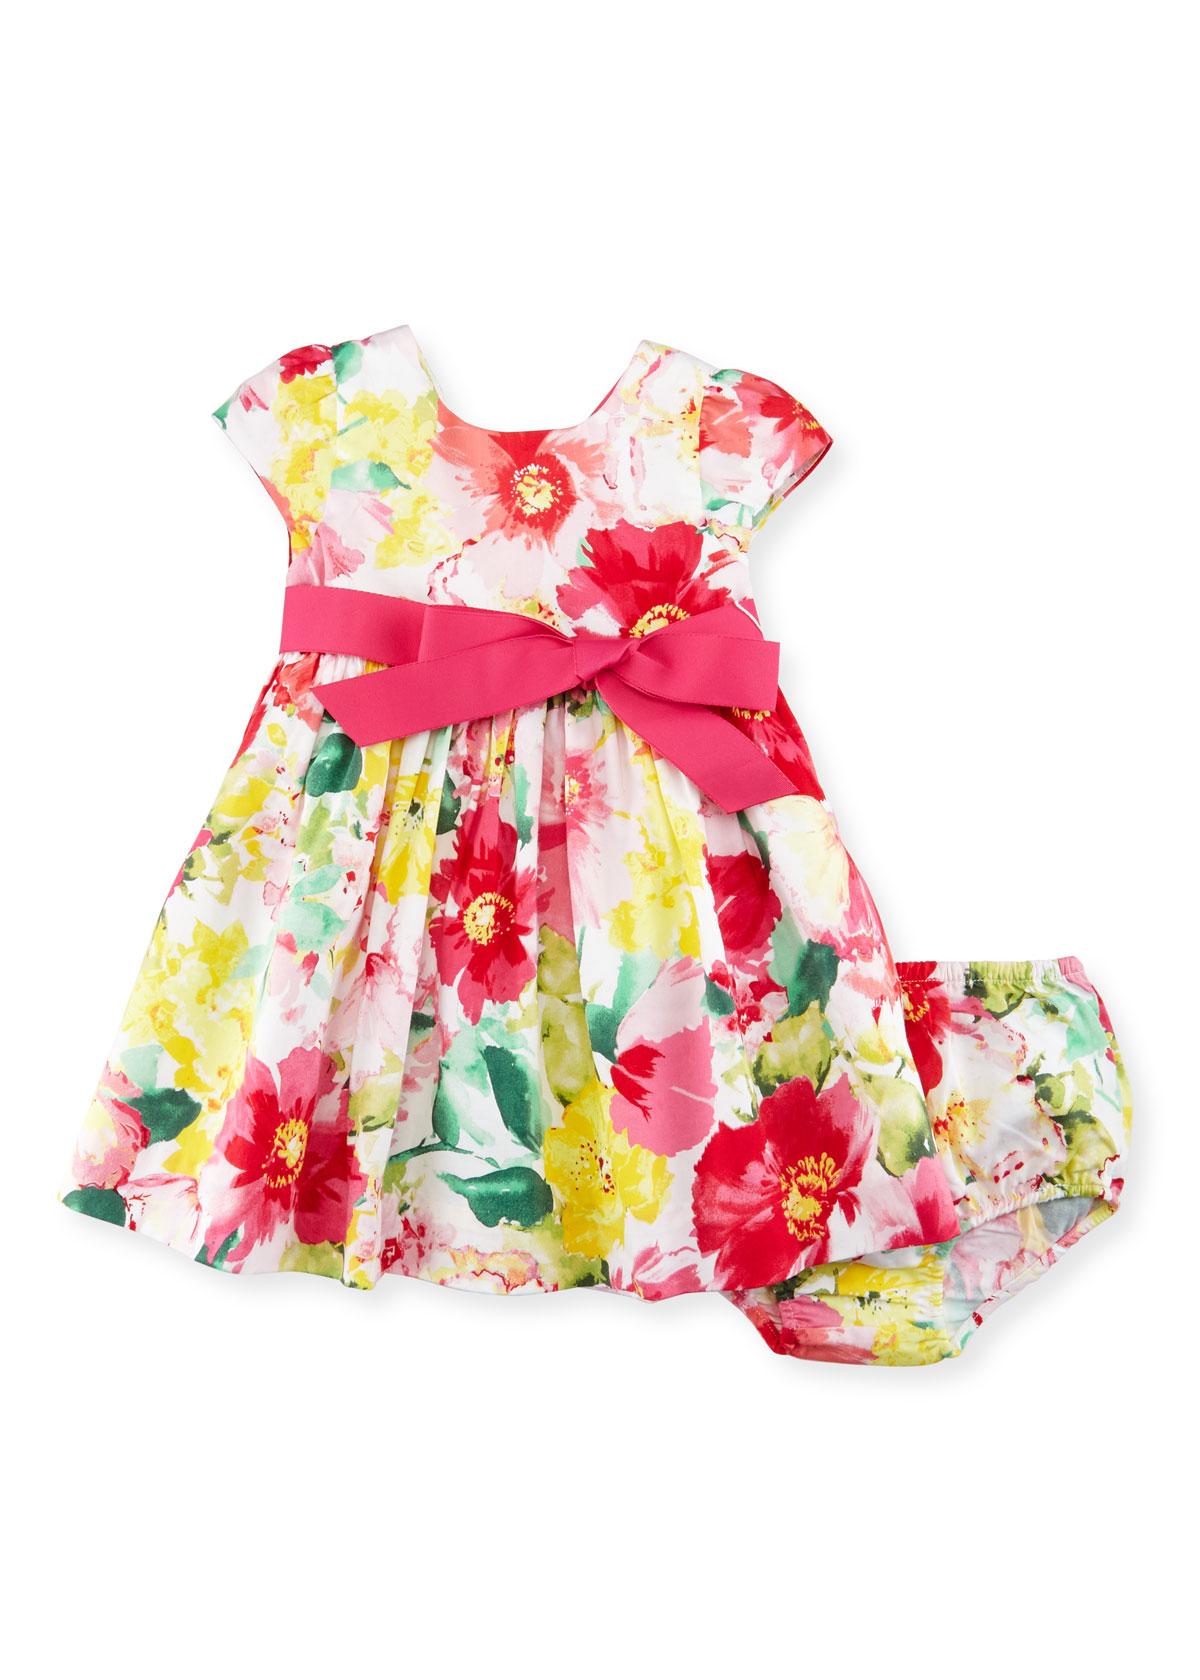 Cap-Sleeve Floral Poplin Dress w/ Bloomers, Pink, Size 9-24 Months